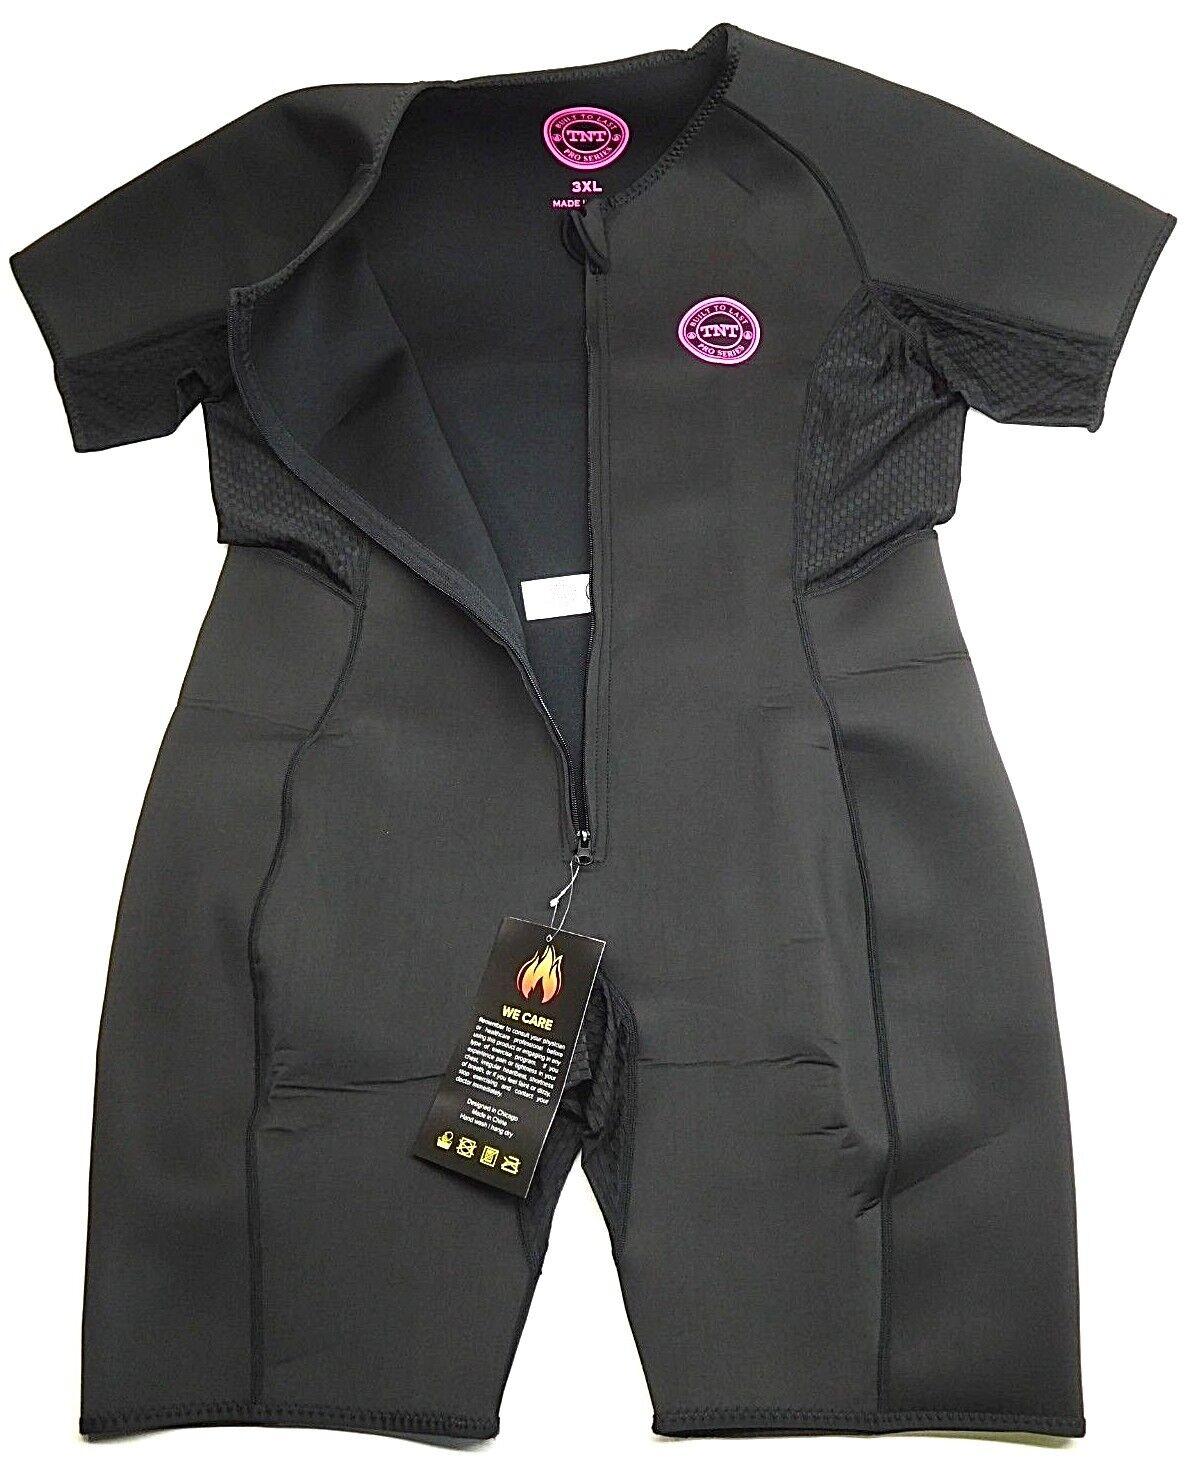 TNT Pro Series Sauna Suit Weight Loss for Men & Damens 3XL